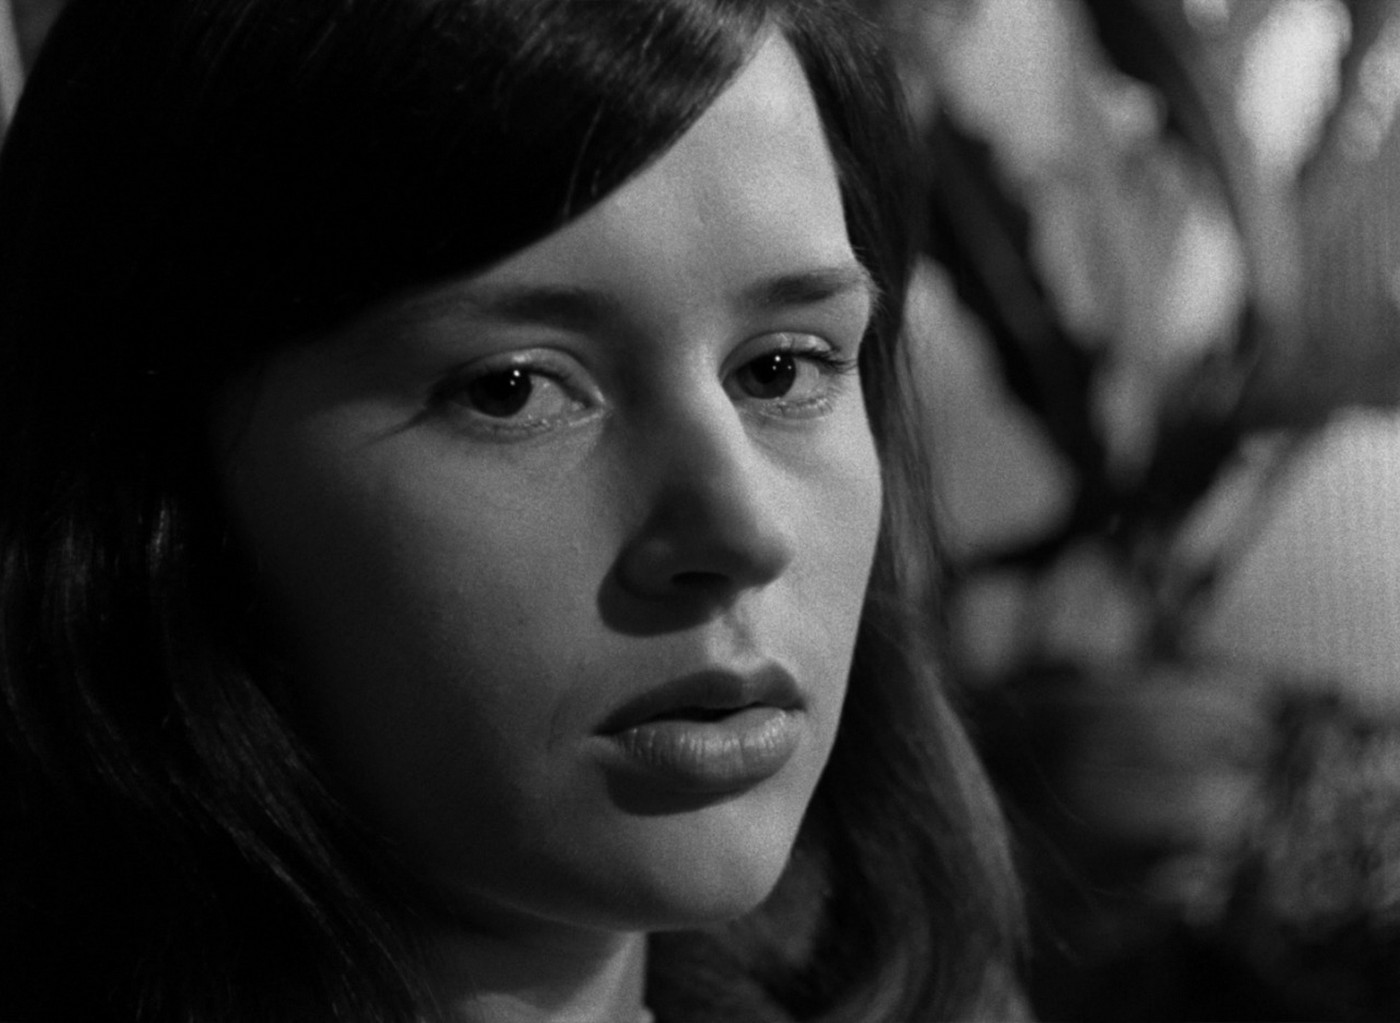 Harriet_Andersson_film_Monika_Ingmar_Bergman_premier_regard_face_camera_histoire_cinema